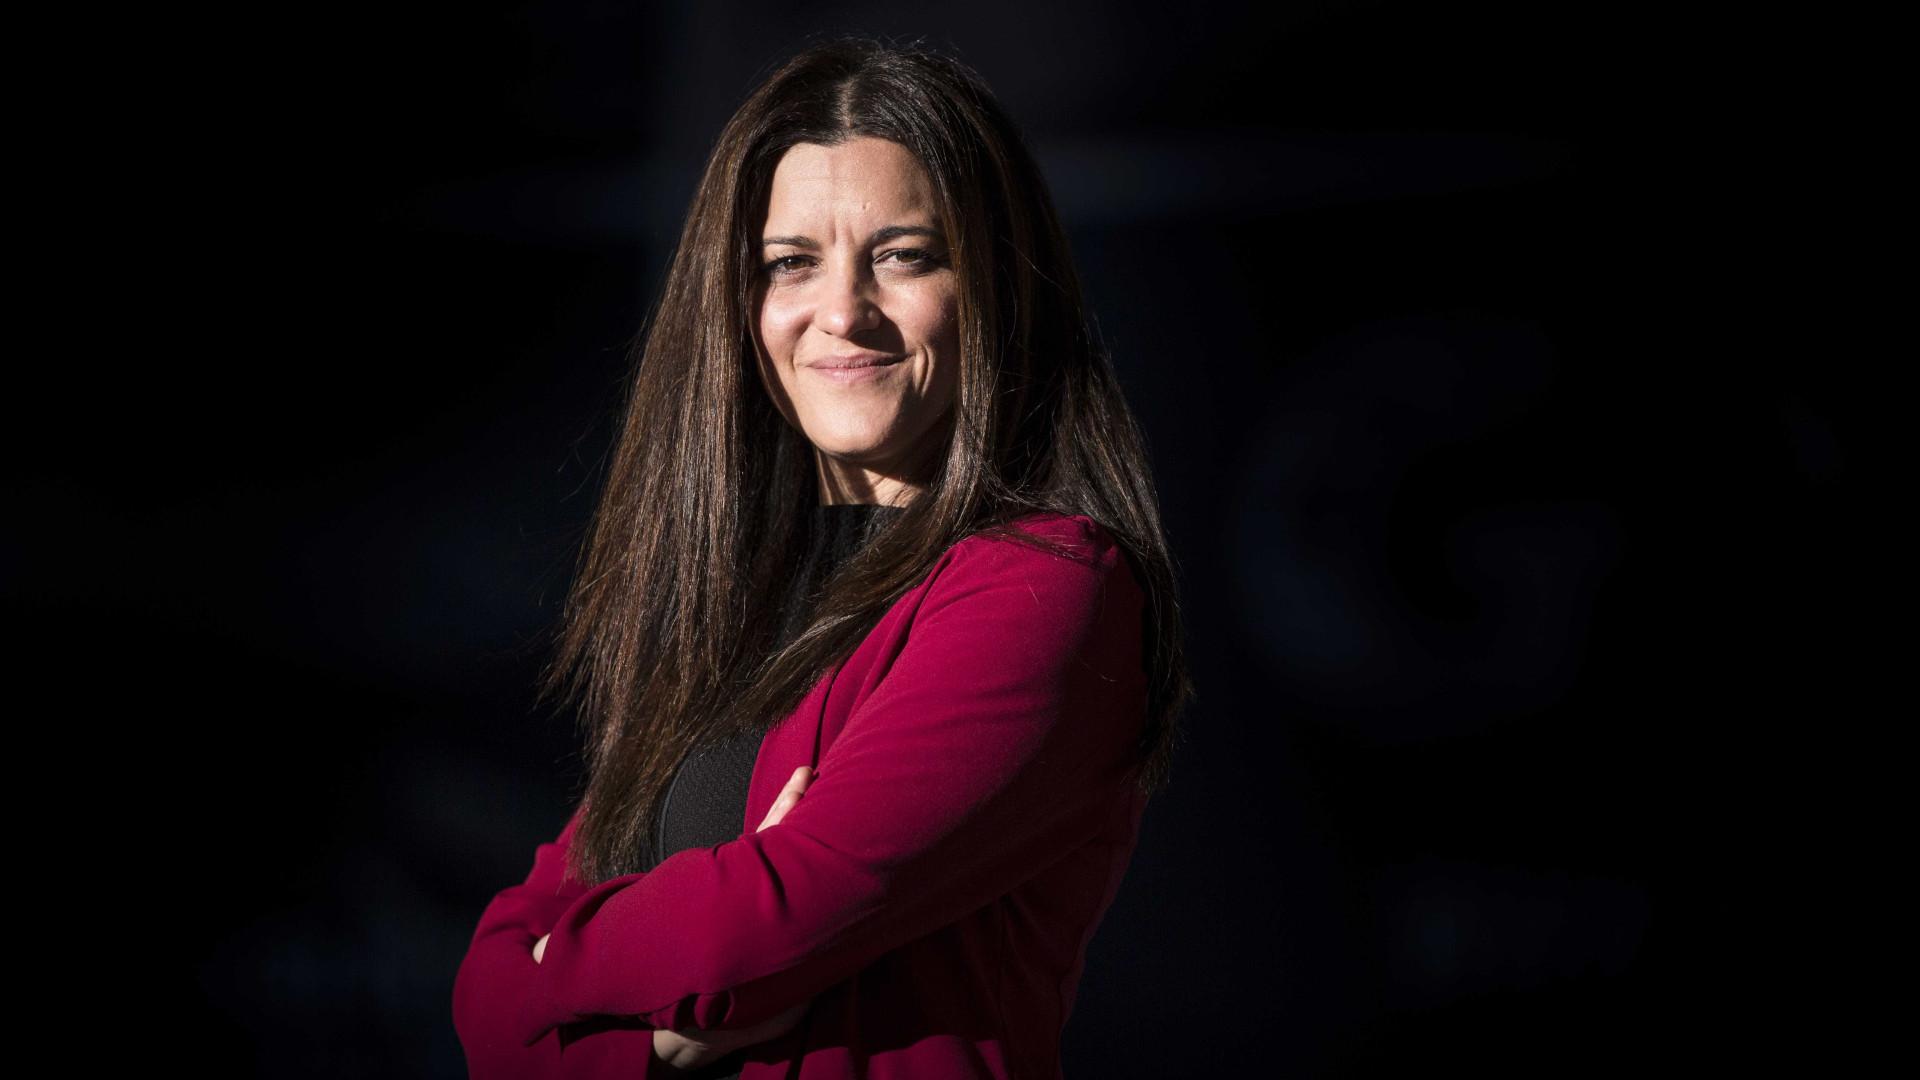 Marisa Matias sem medo de apoiar Mélenchon em Paris